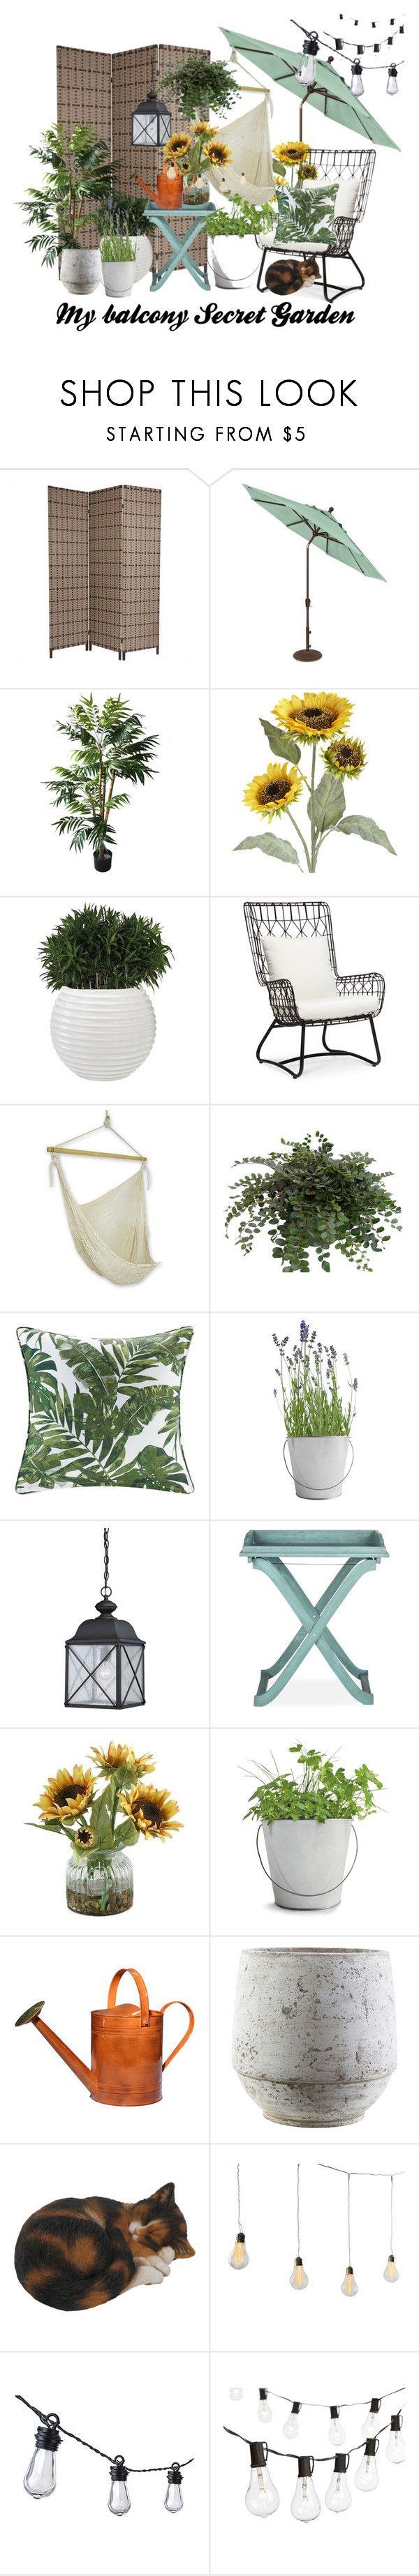 """Secret Garden"" by izostworekblogspot on Polyvore featuring interior, interiors, interior design, dom, home decor, interior decorating, TradeMark, Pier 1 Imports, Palecek i NOVICA"